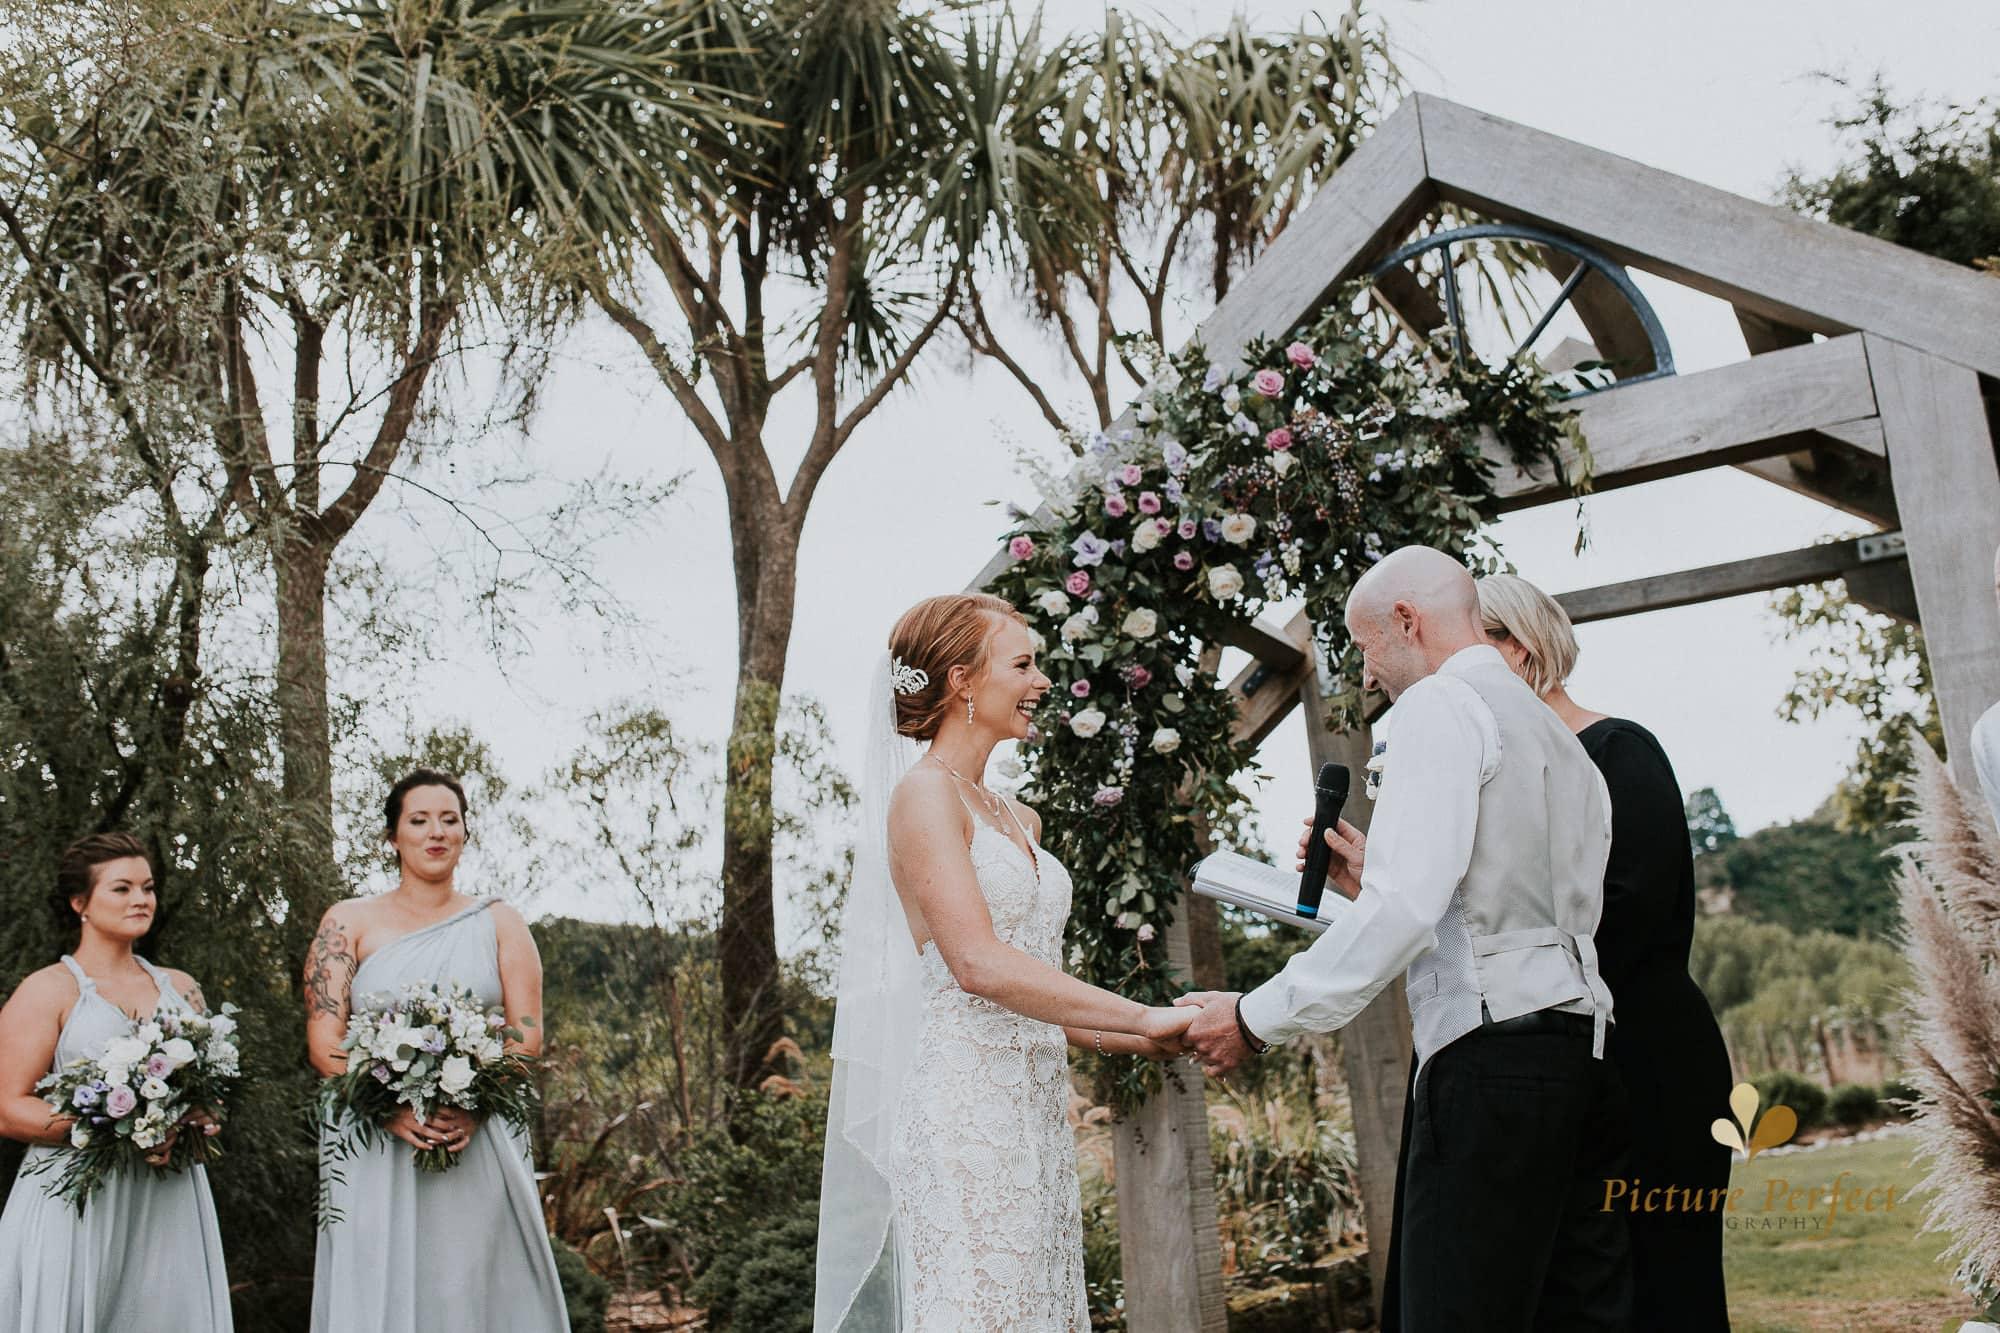 Freya and Matt fun wedding photography 0187